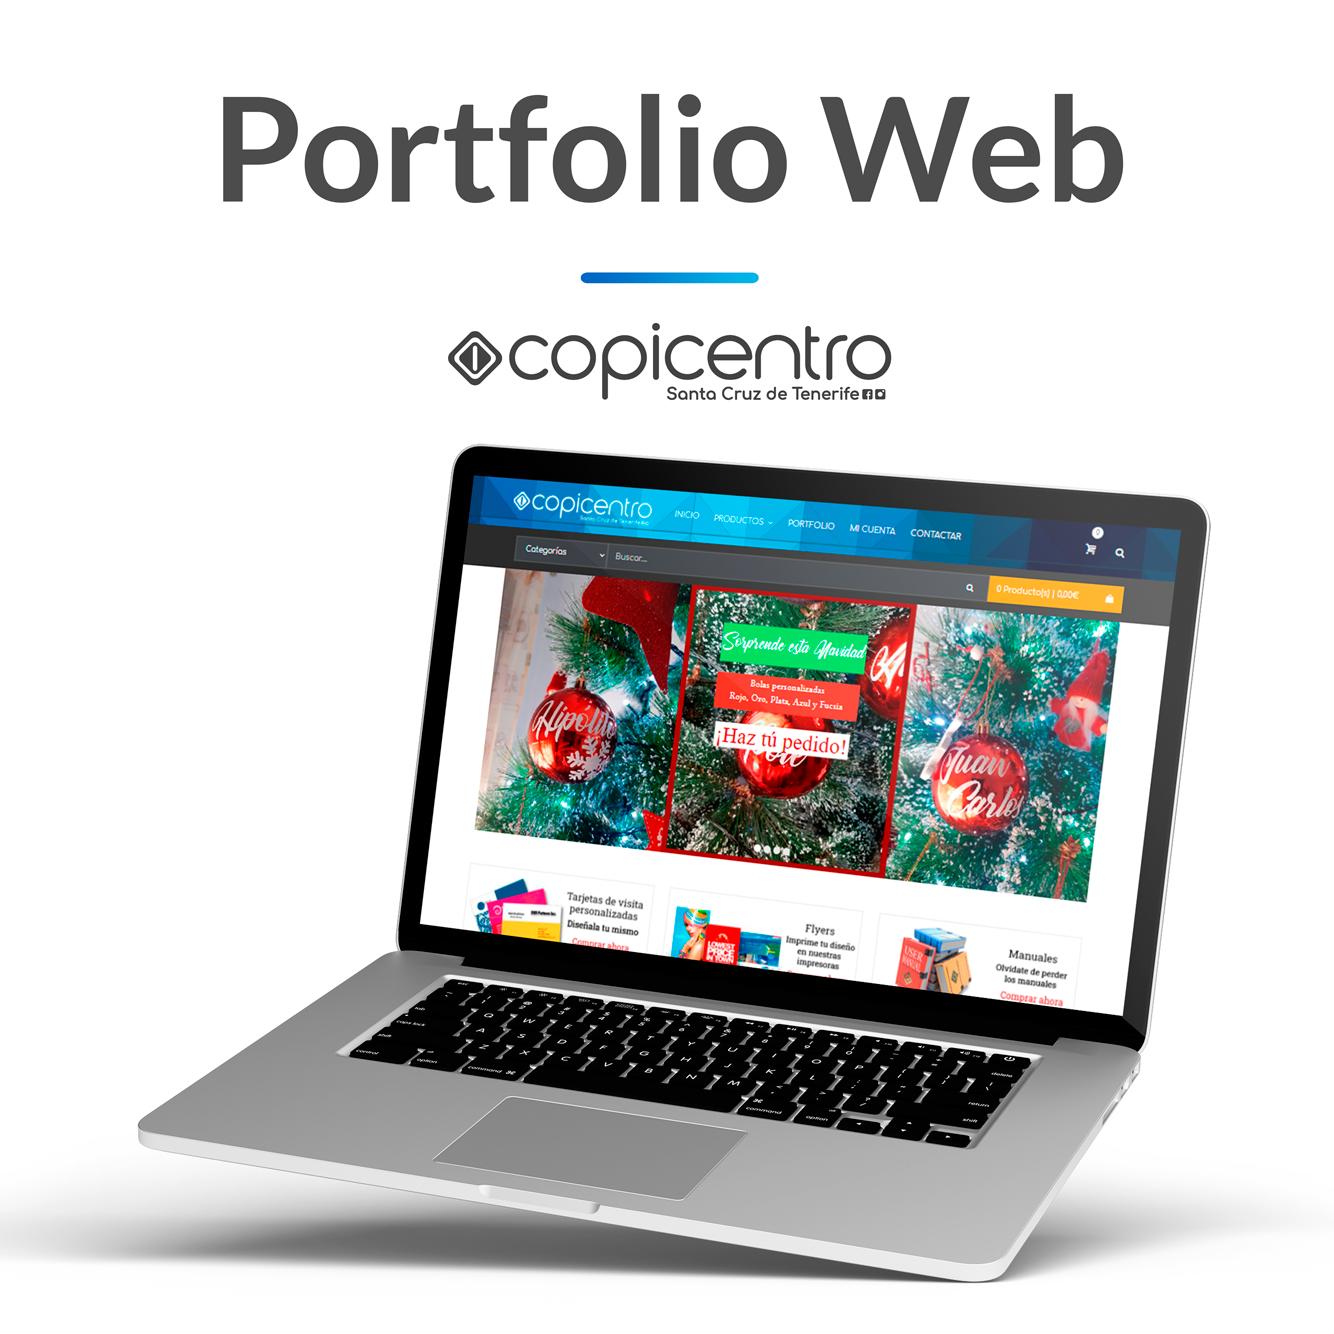 Portfolio Copicentro Tu Imrpesora en Internet X-Net